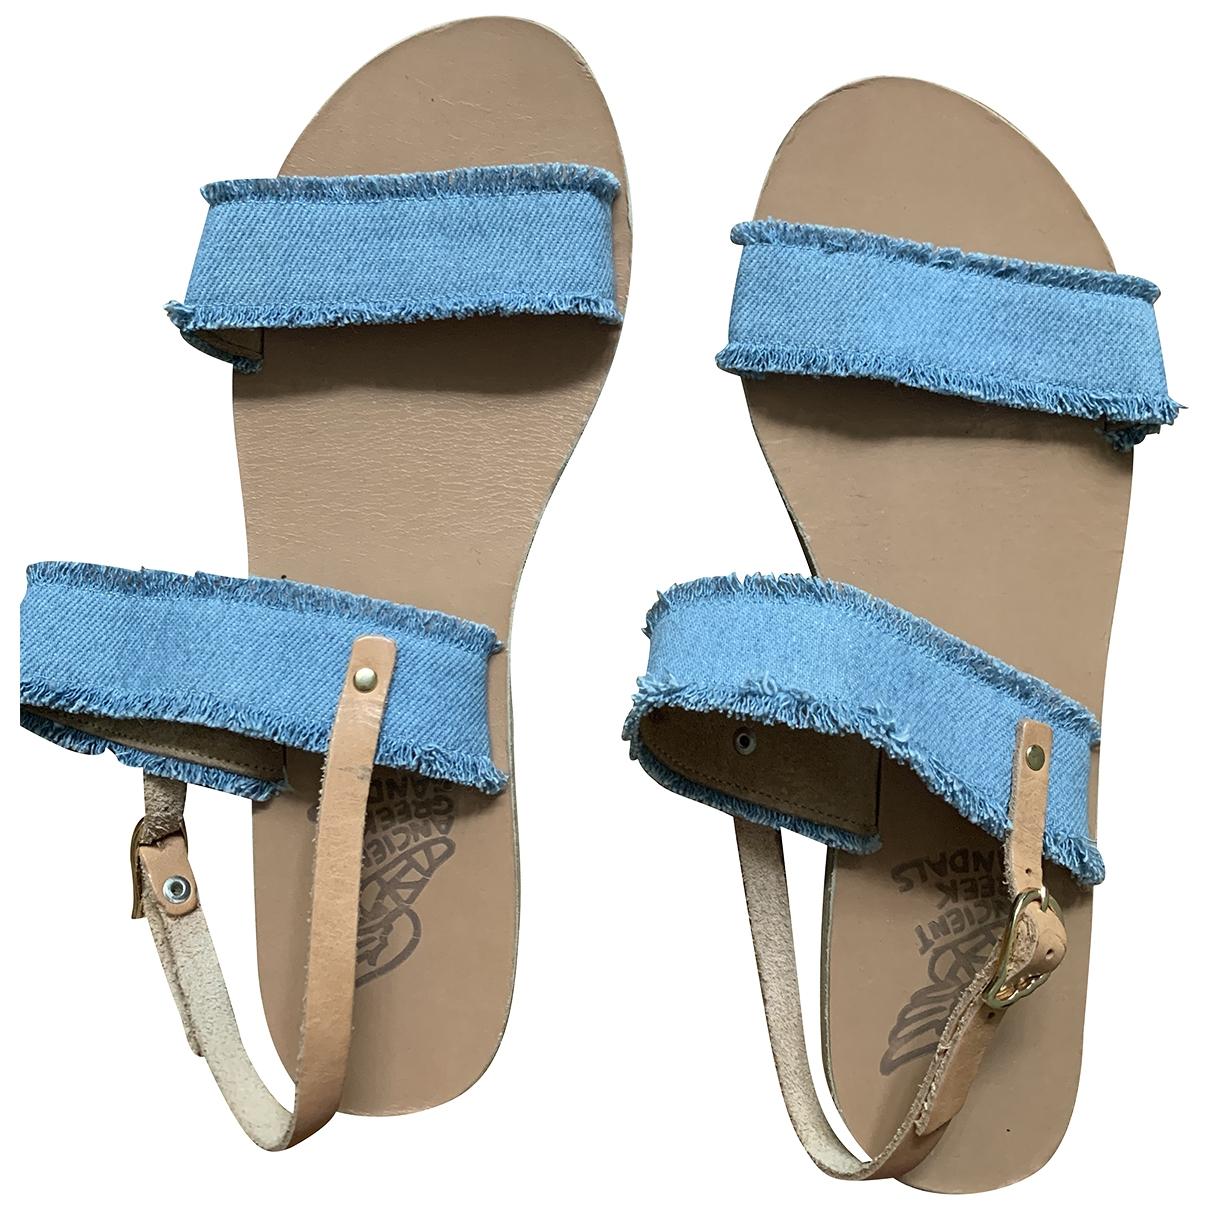 Sandalias romanas de Lona Ancient Greek Sandals